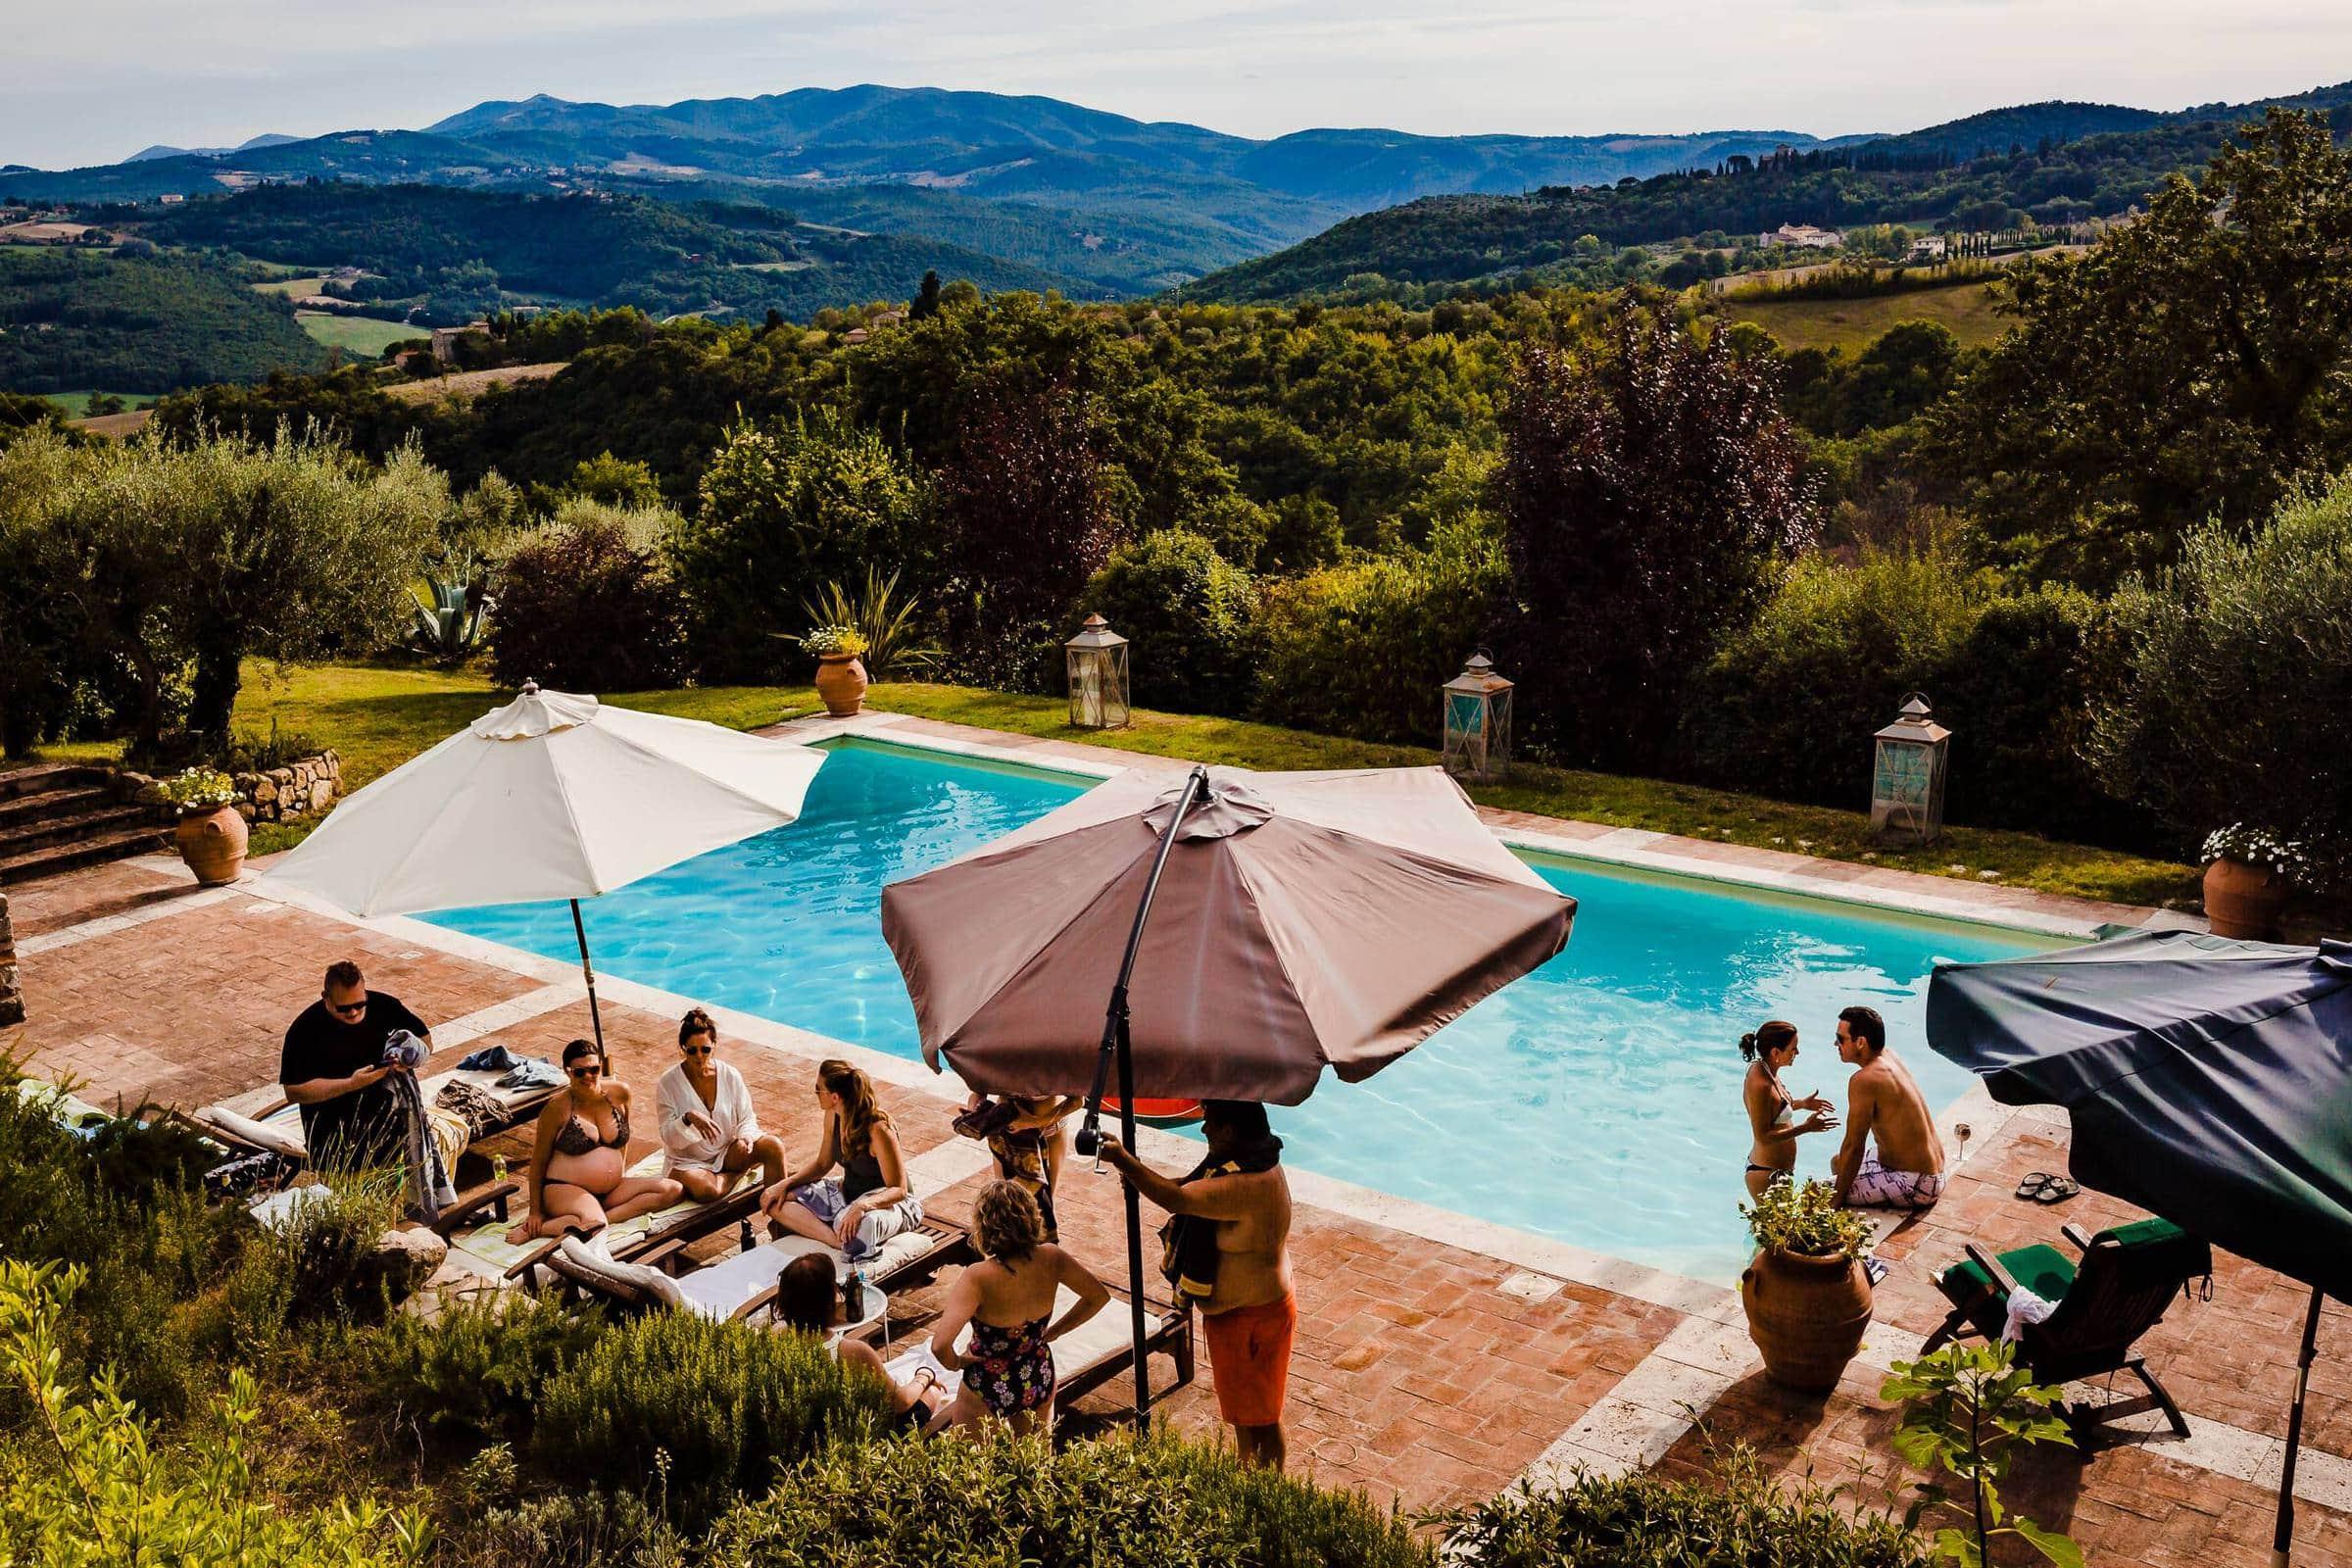 Guest enjoying a pool party during a Villa Tre Grazie wedding celebration near Todi, Italy.